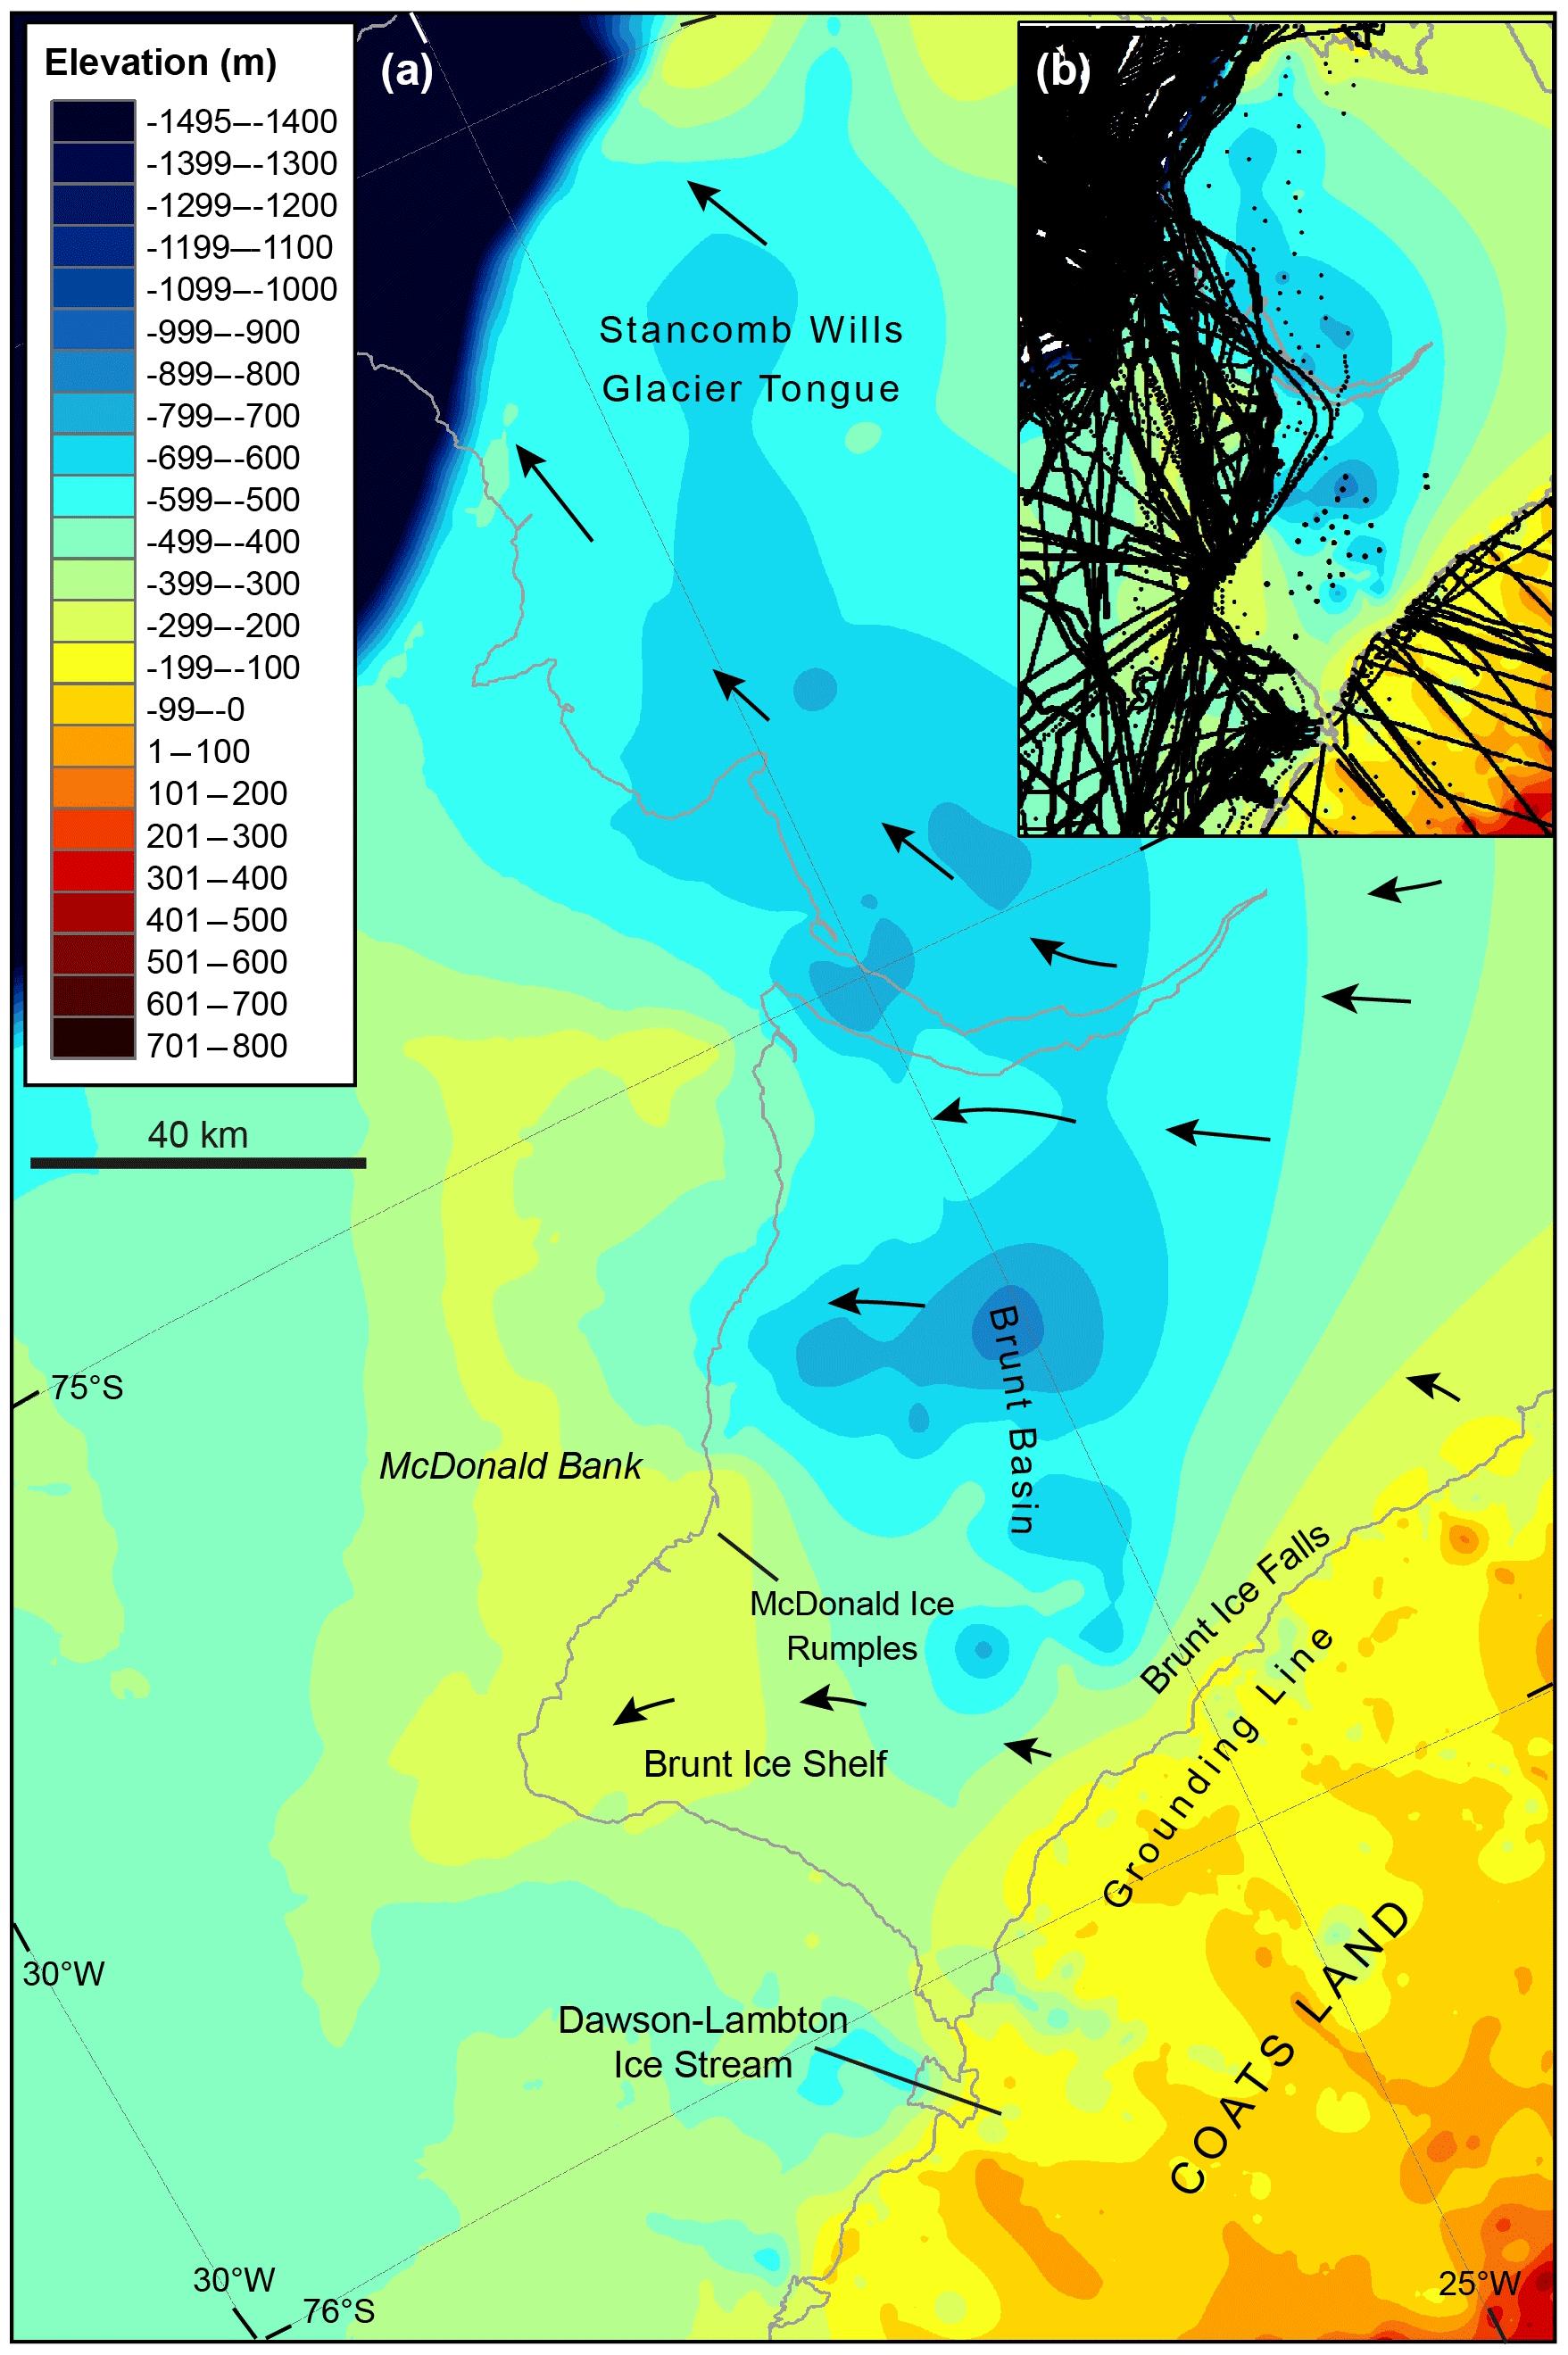 TC - Deglaciation and future stability of the Coats Land ice margin